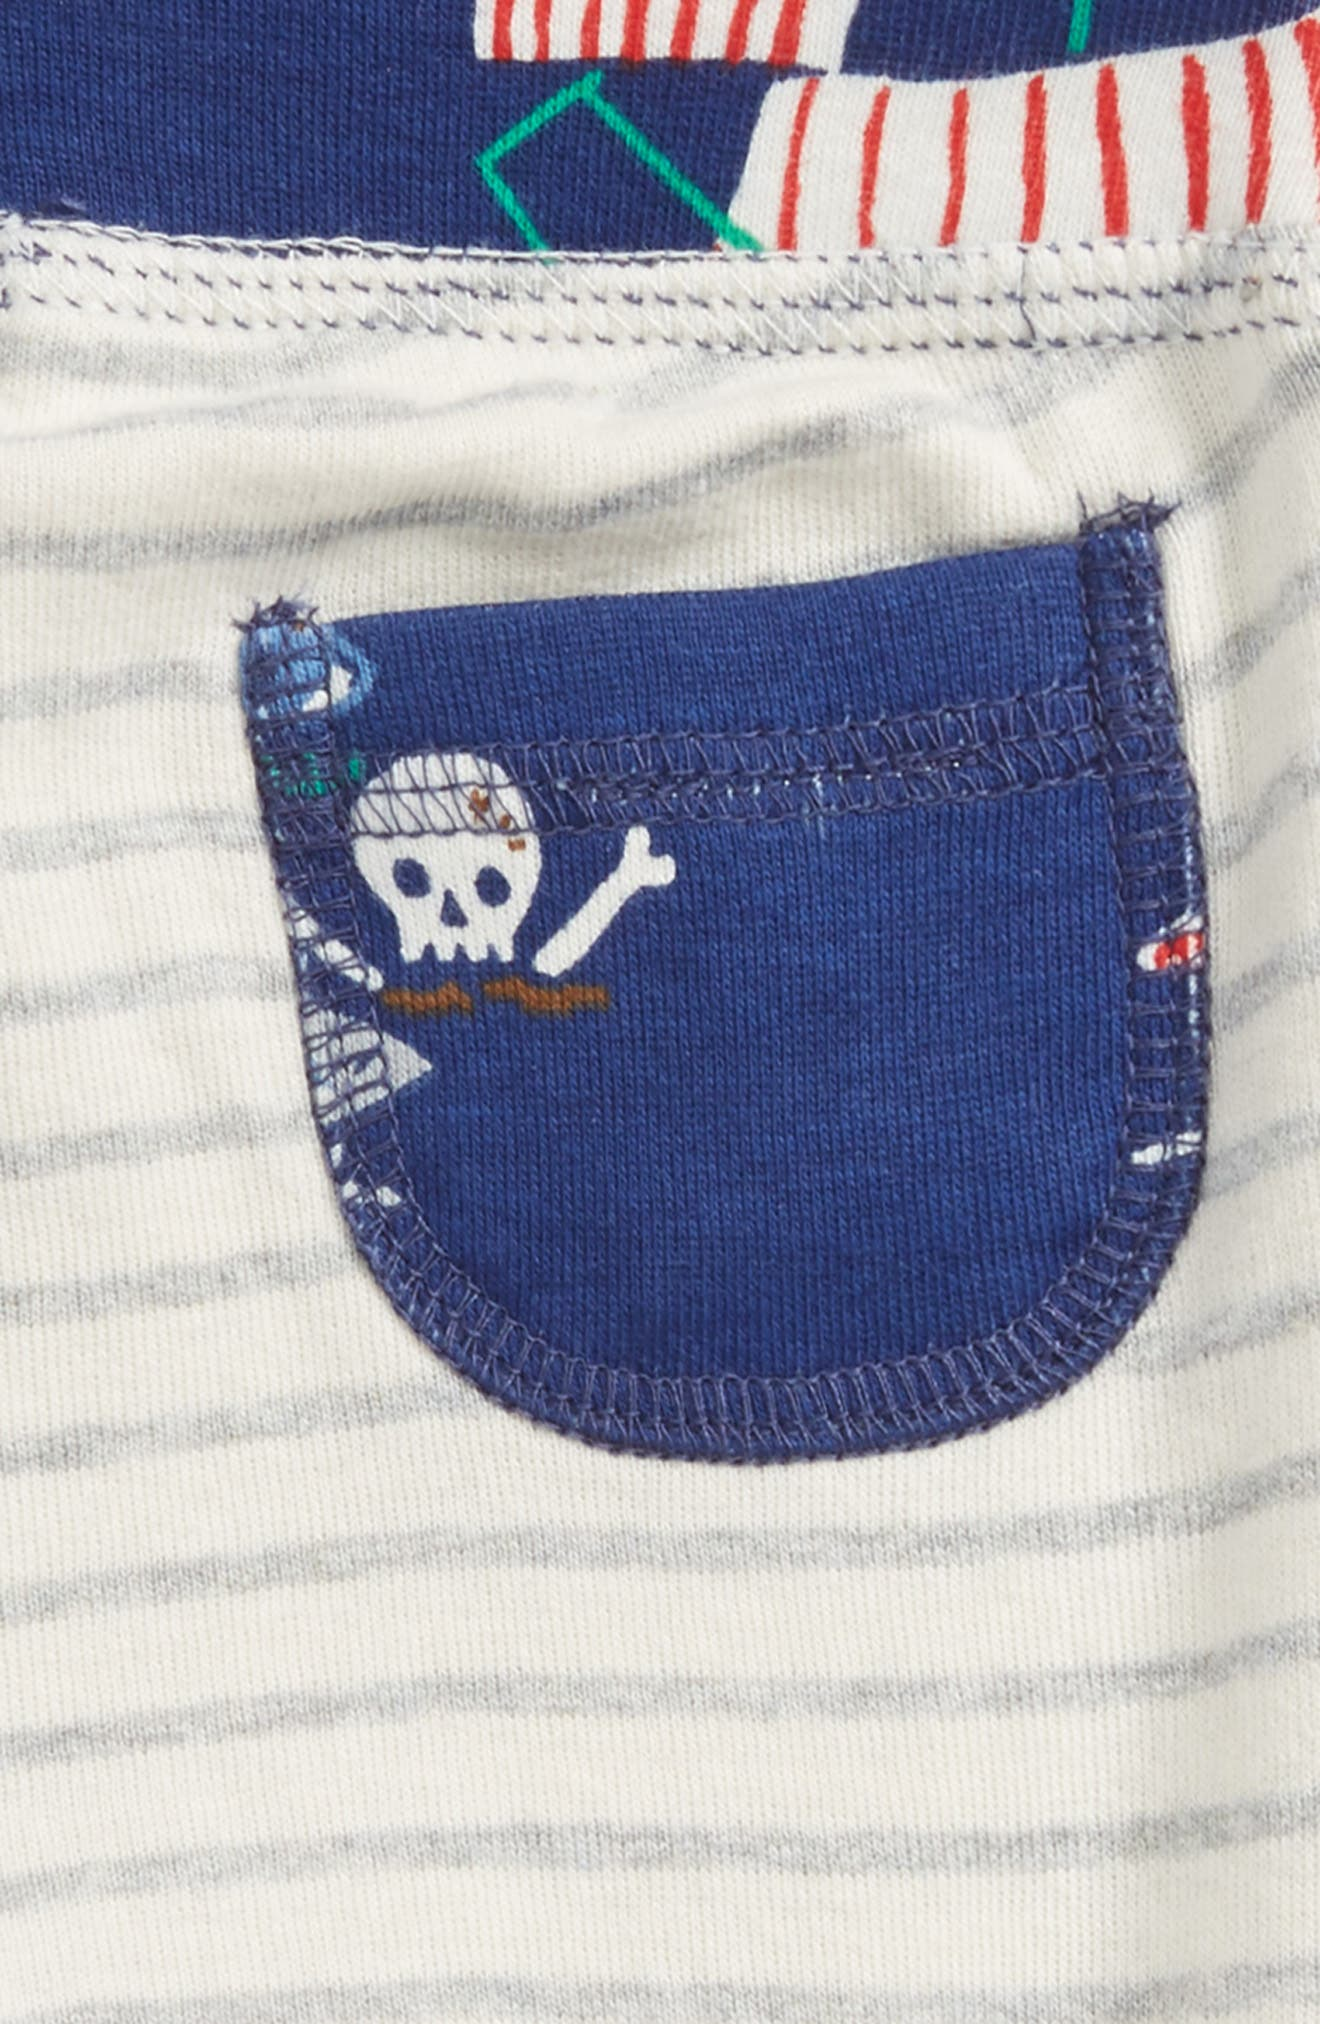 Reversible Knee Patch Pants,                             Alternate thumbnail 4, color,                             Beacon Blue/ Pirate Ship